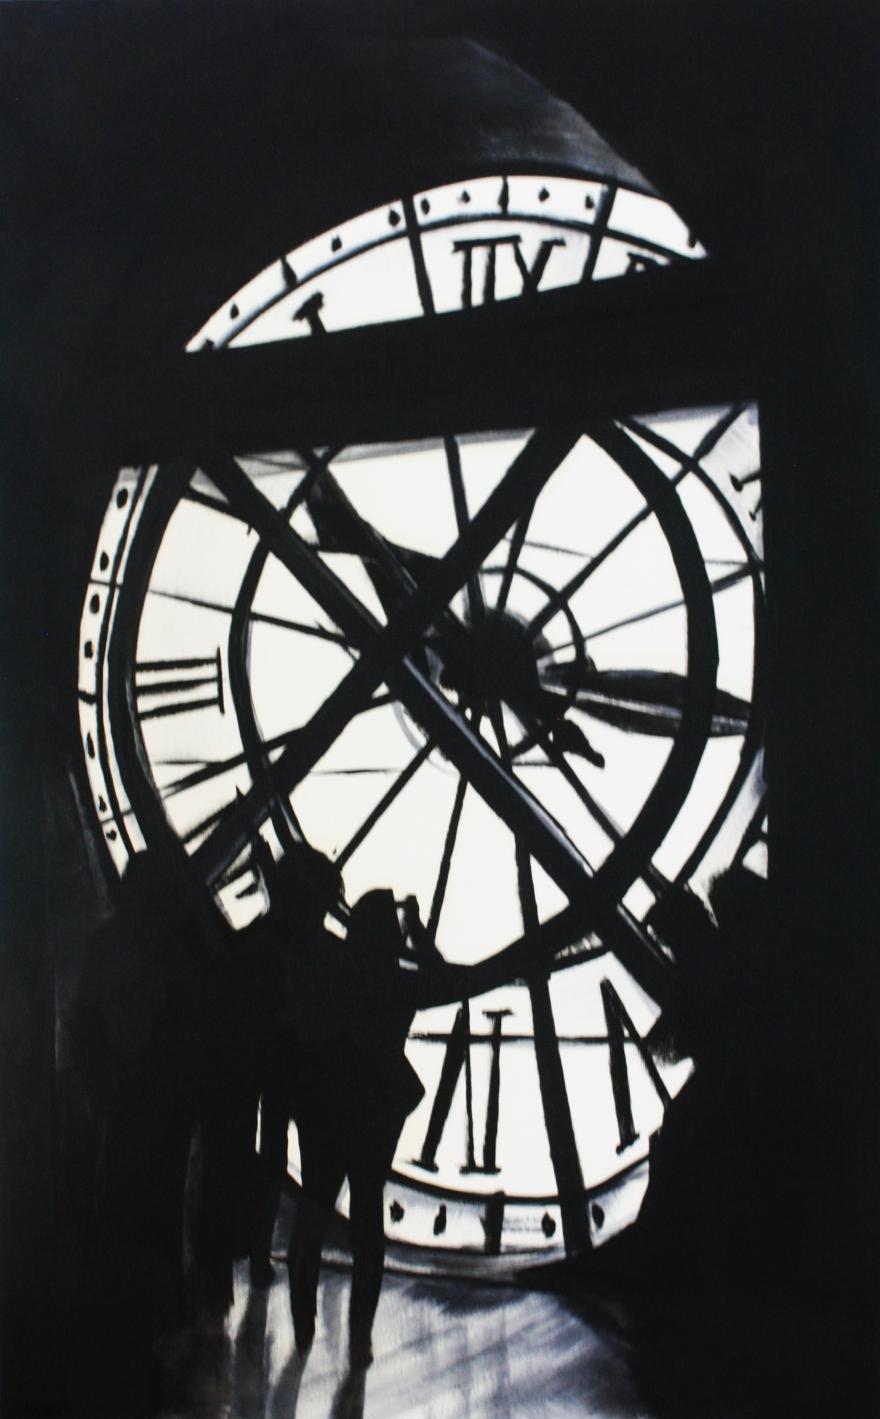 Adam Chapman - Travail d'Horloge